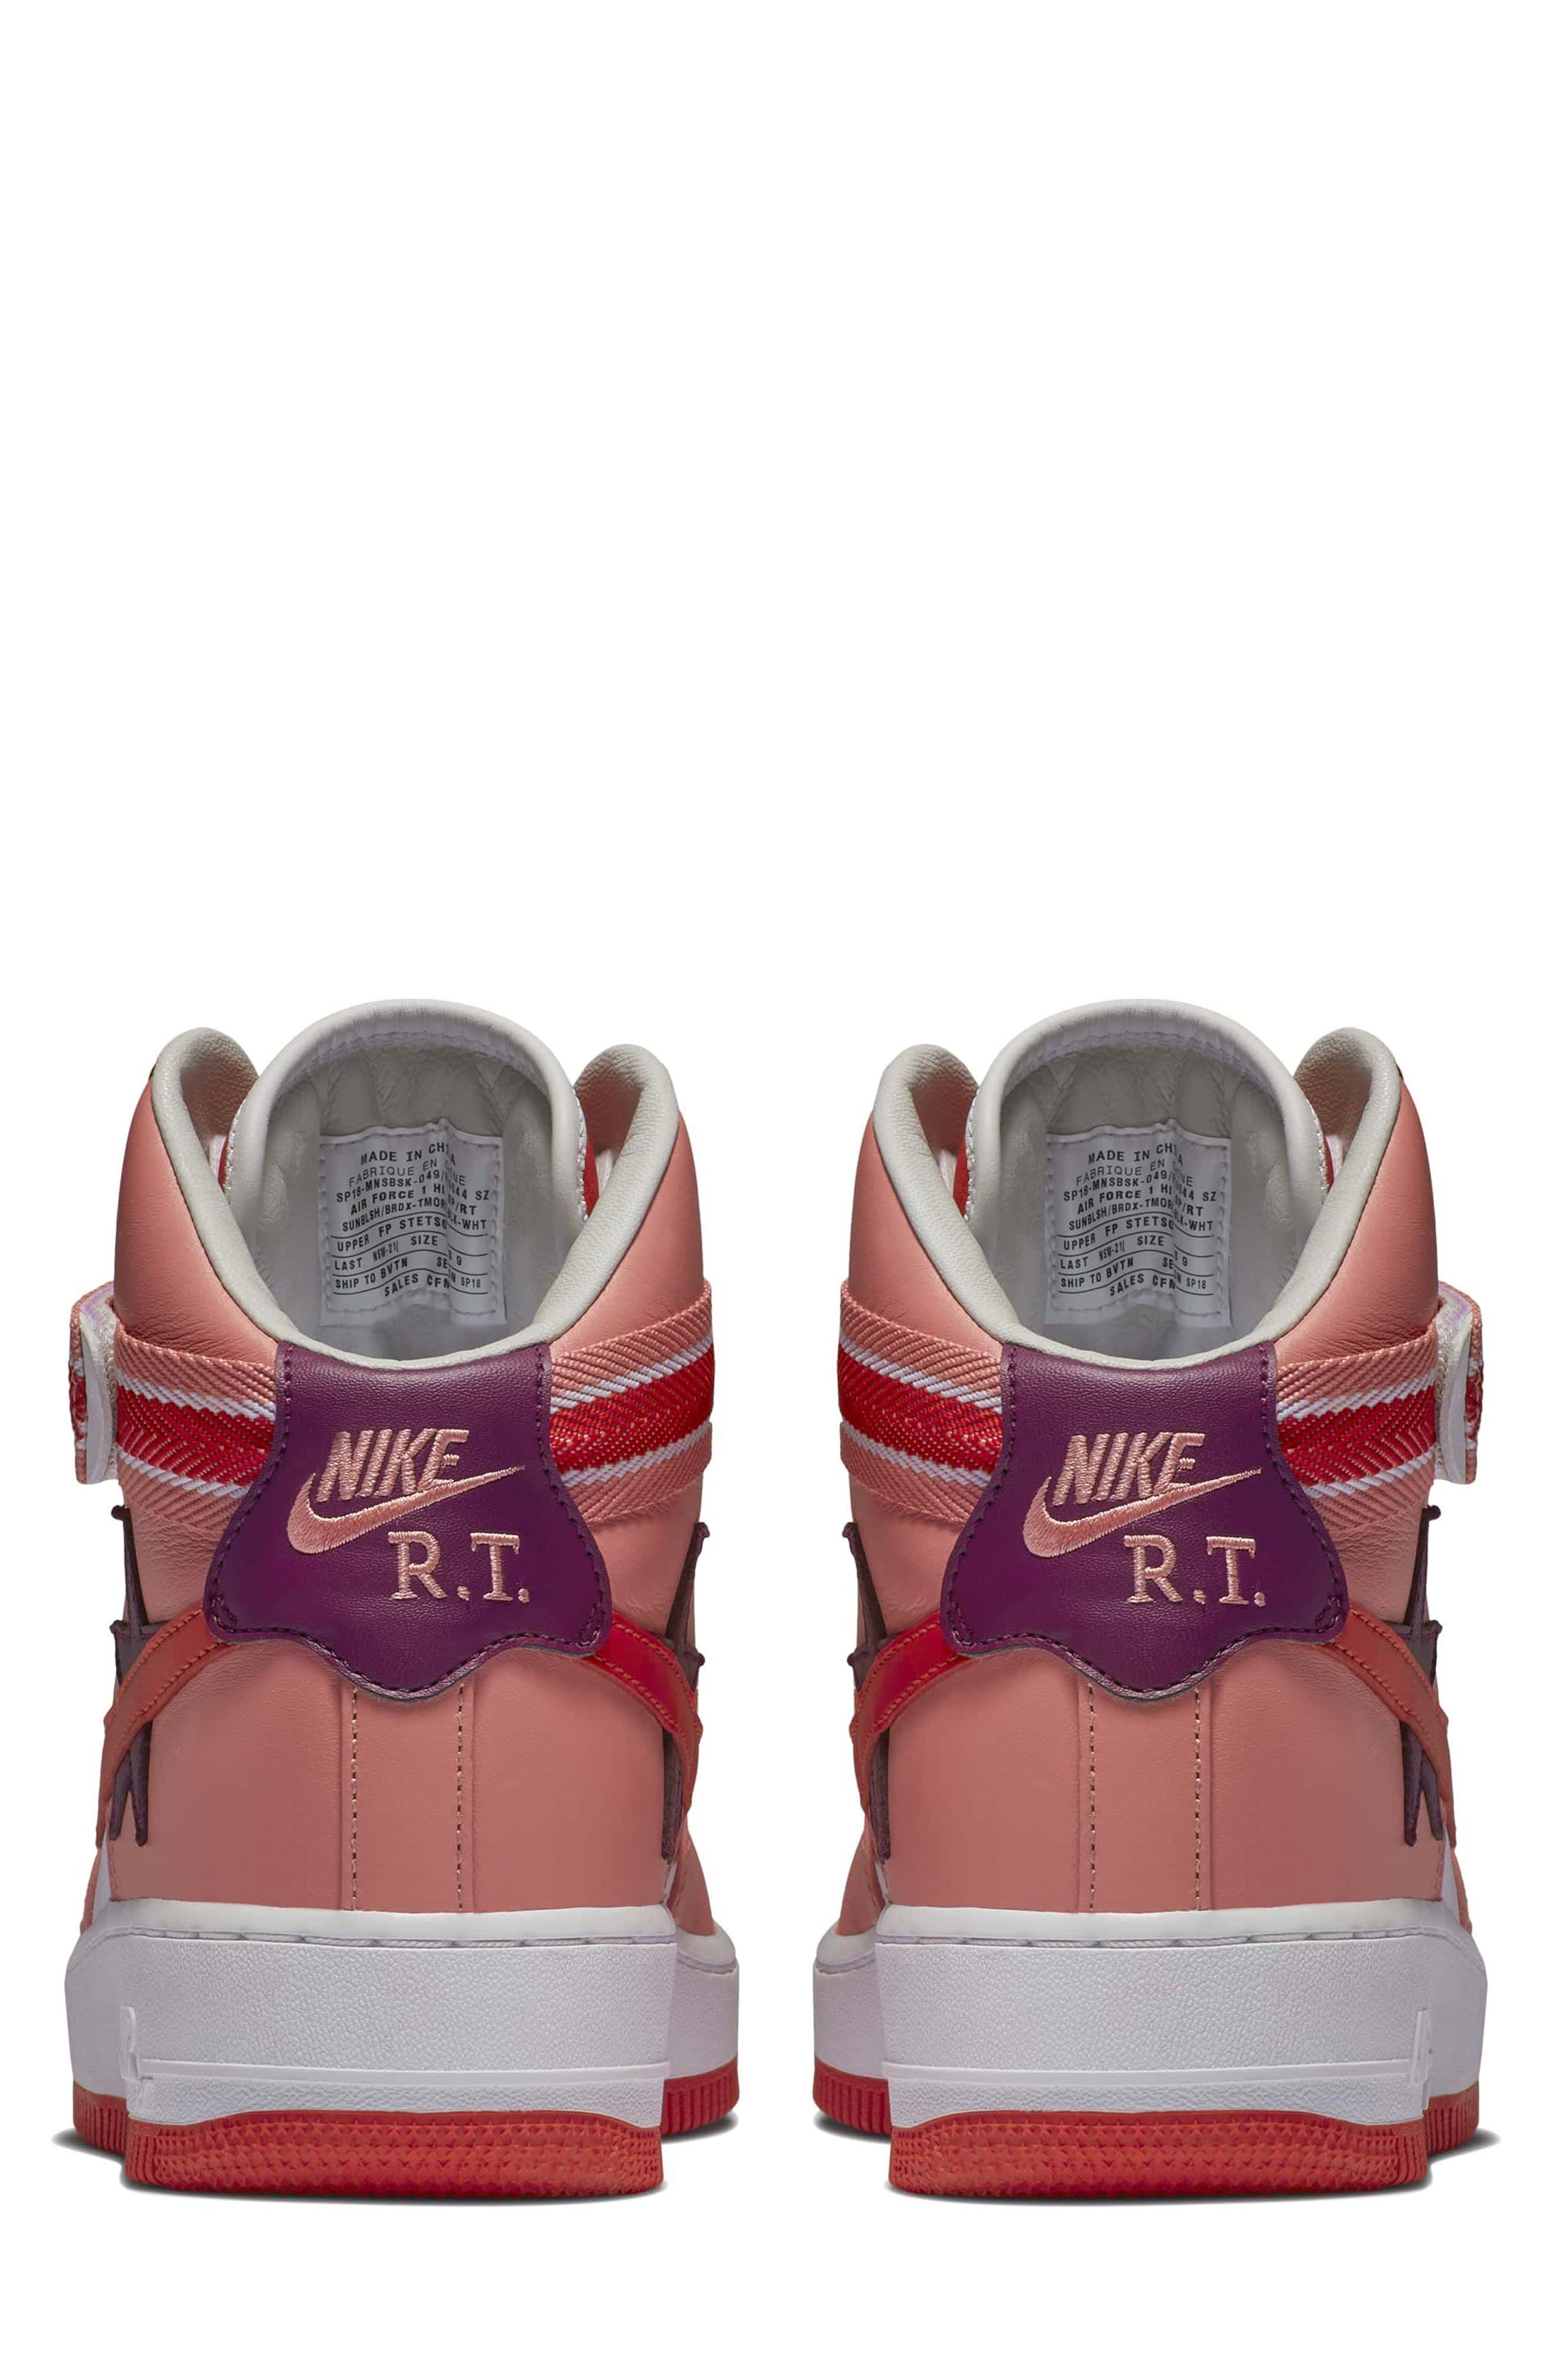 Air Force 1 High RT Sneaker,                             Alternate thumbnail 2, color,                             Coral/ Bordeax/ Orange/ Black